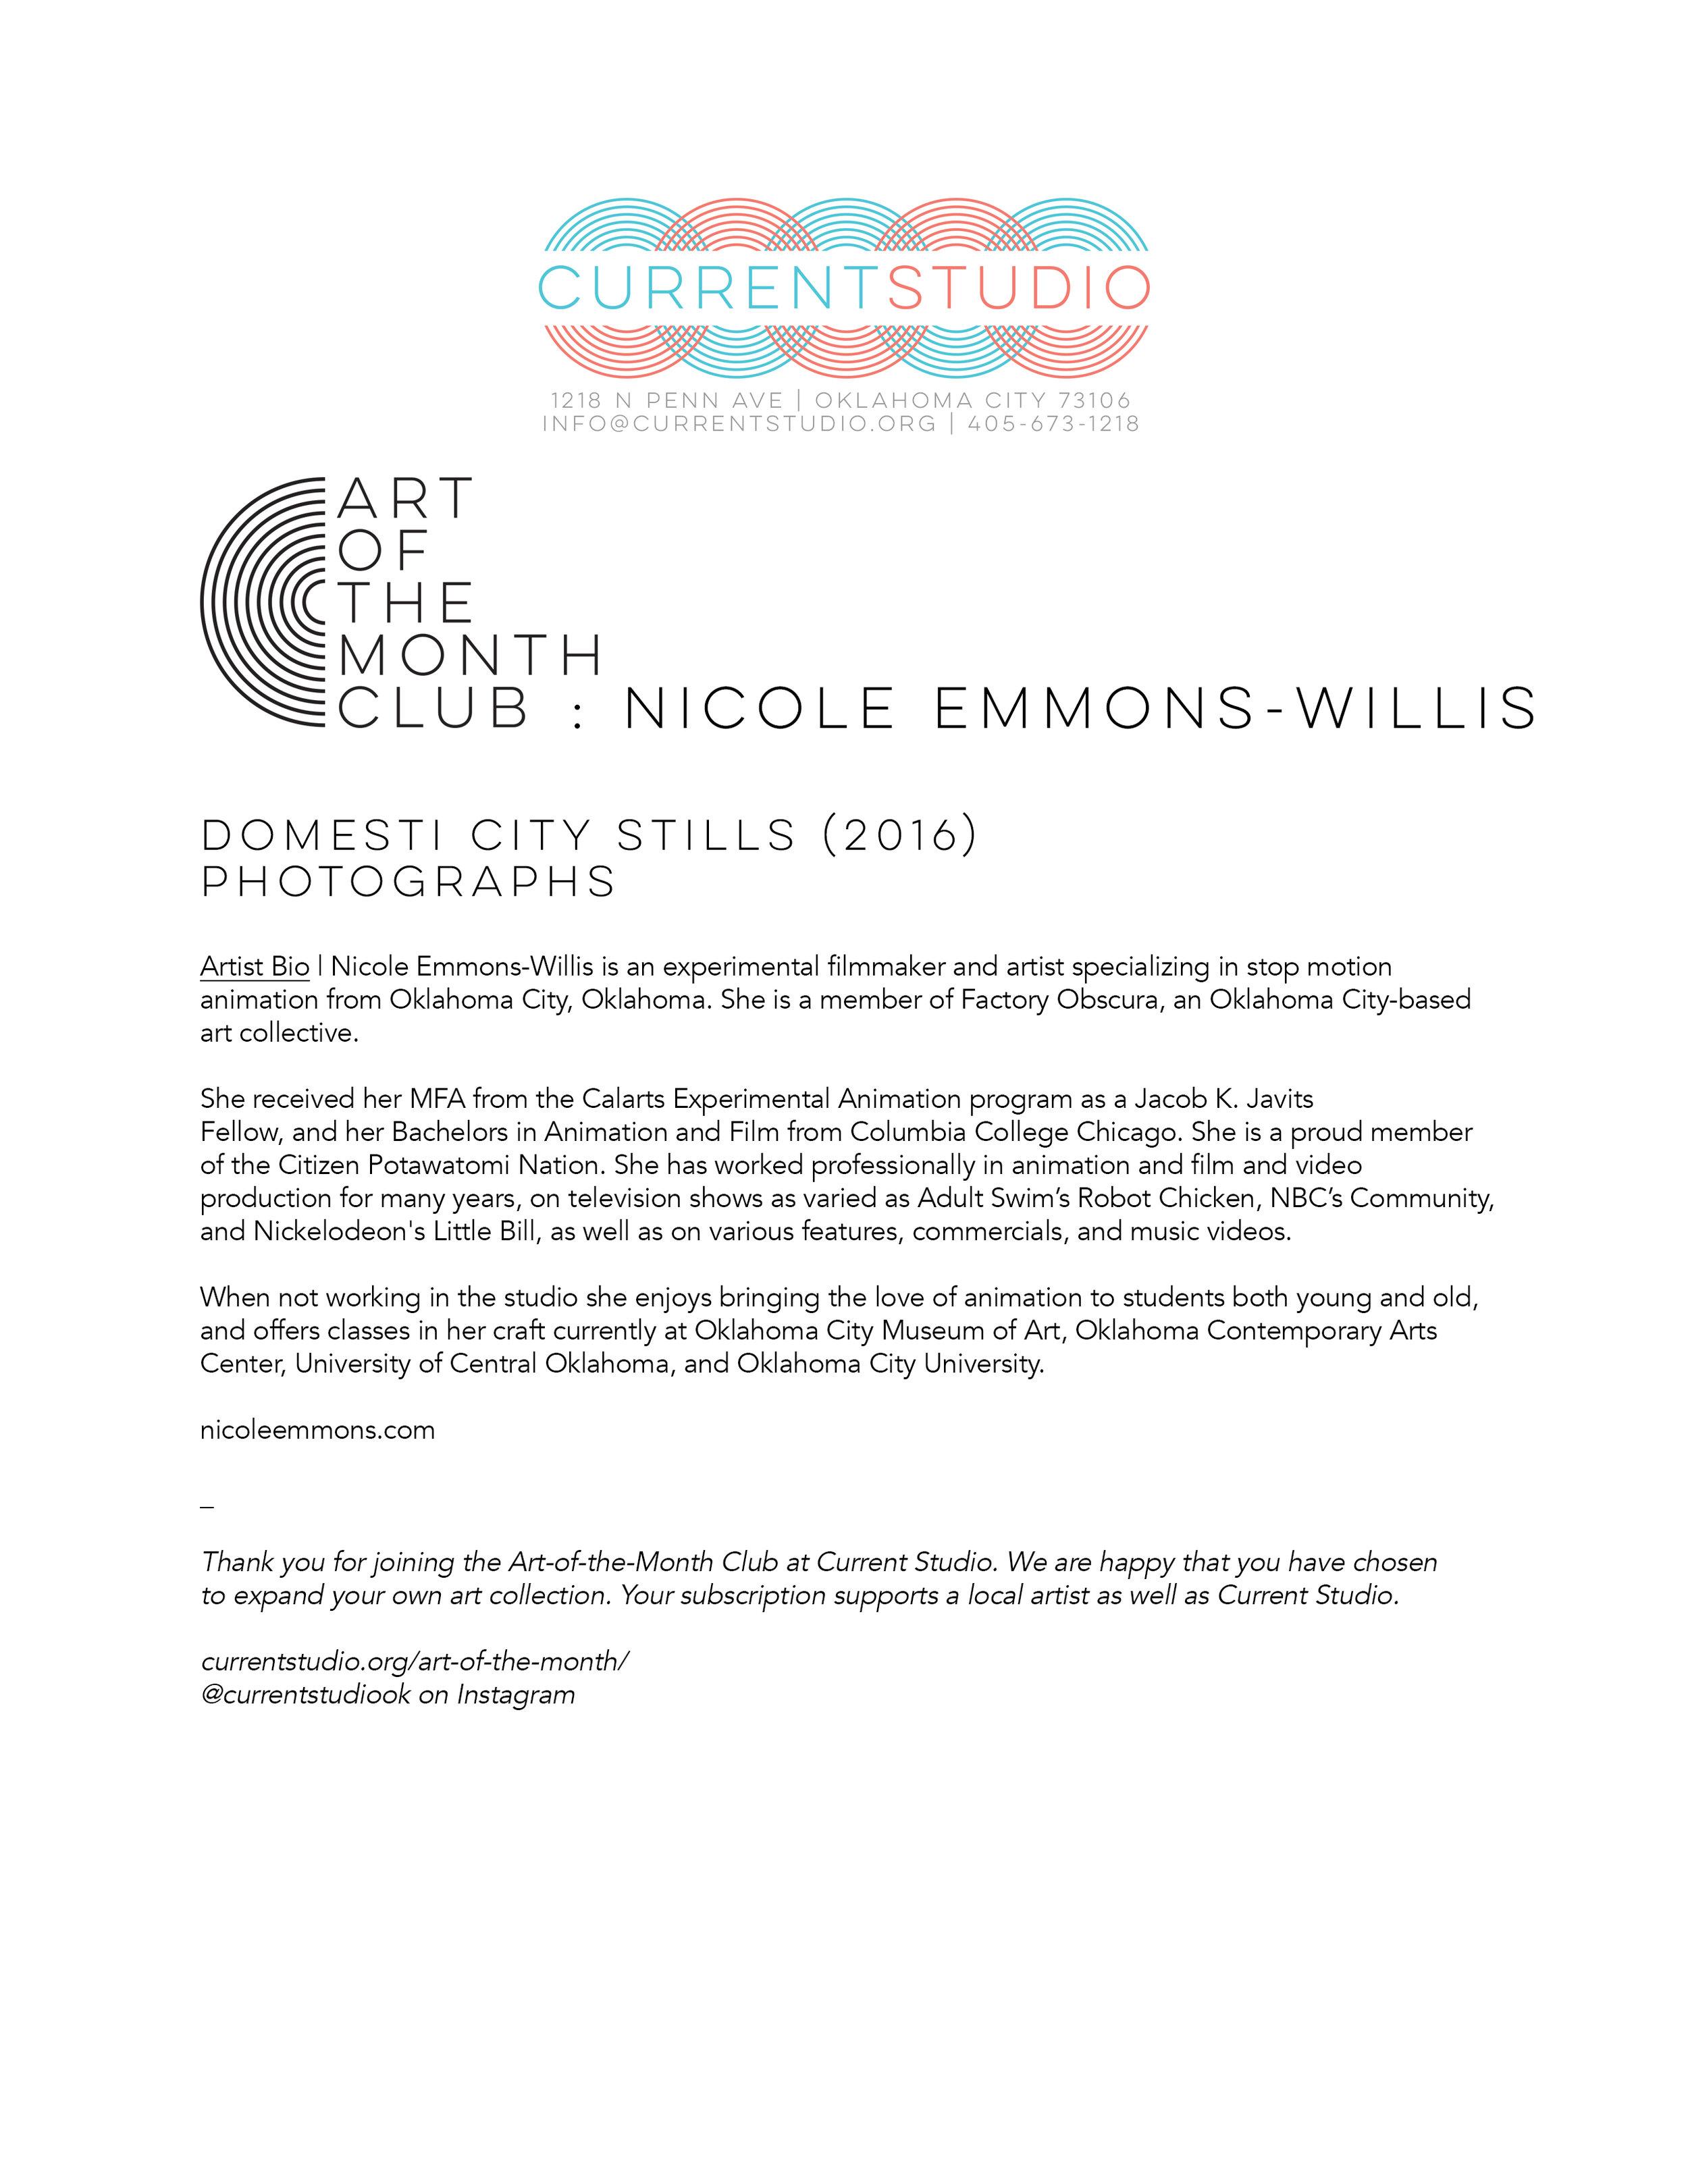 art of the month artist sheet - nicole emmons willis.jpg